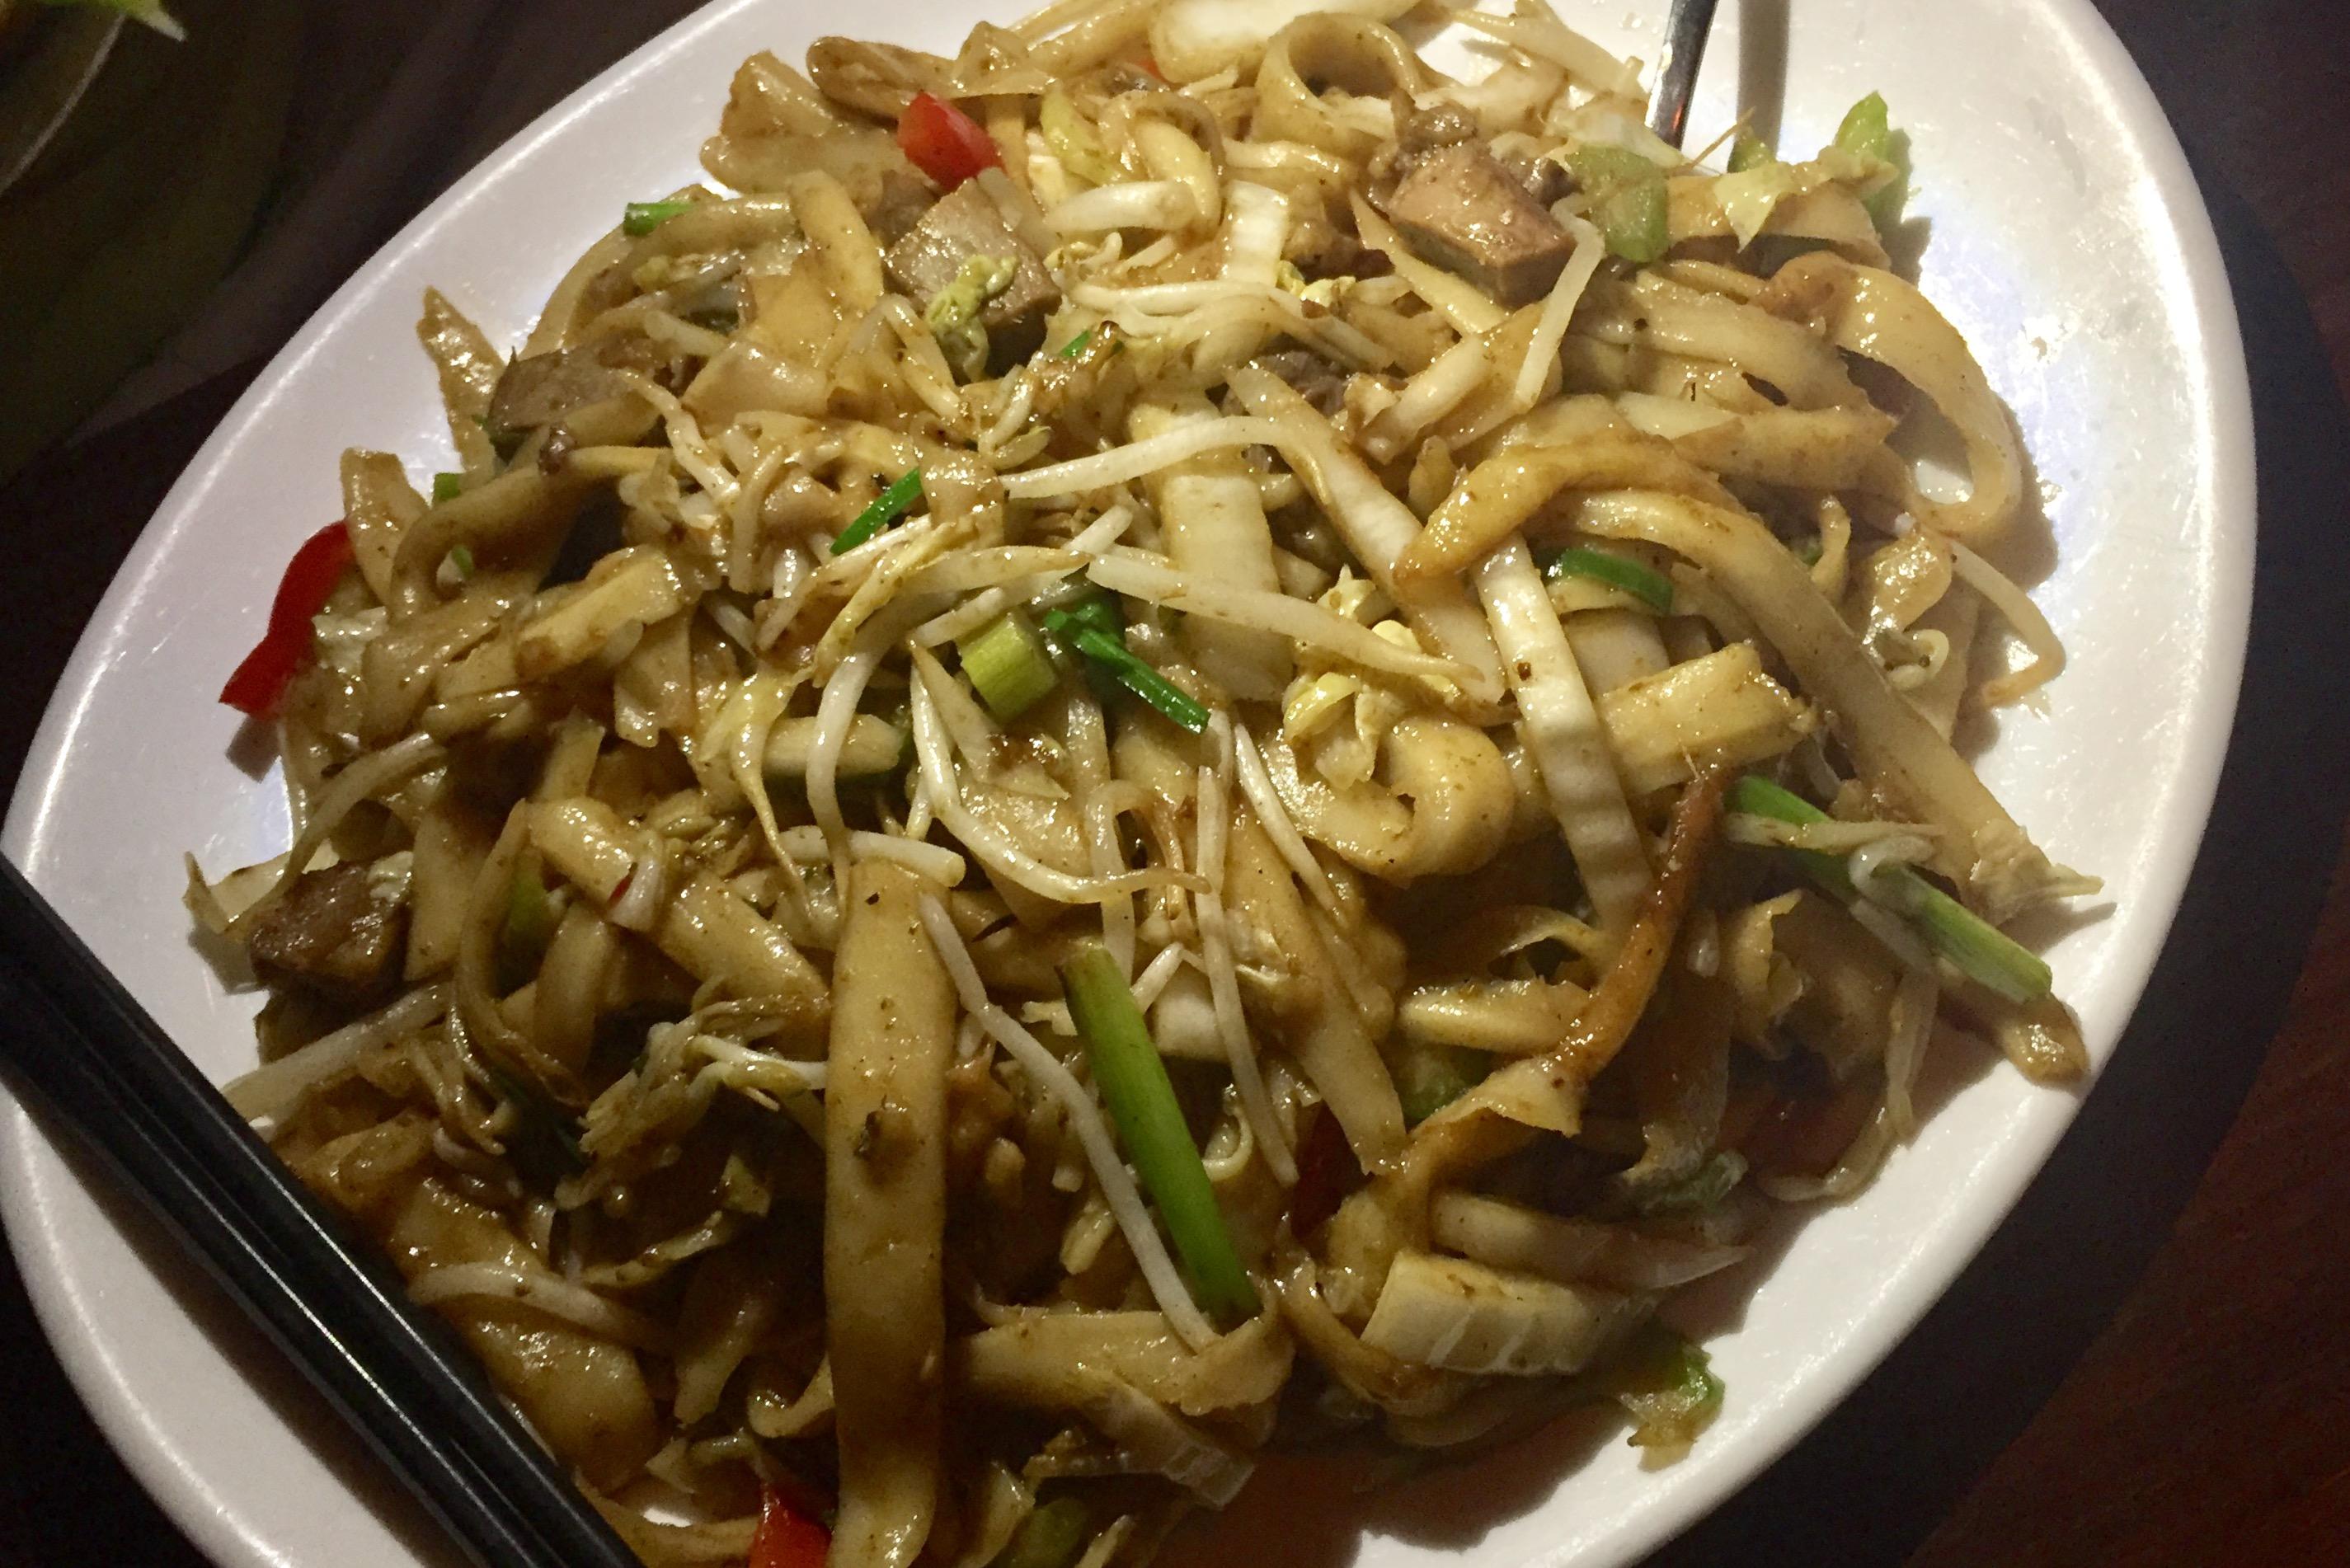 Stir fried sliced noodles with tofu and egg